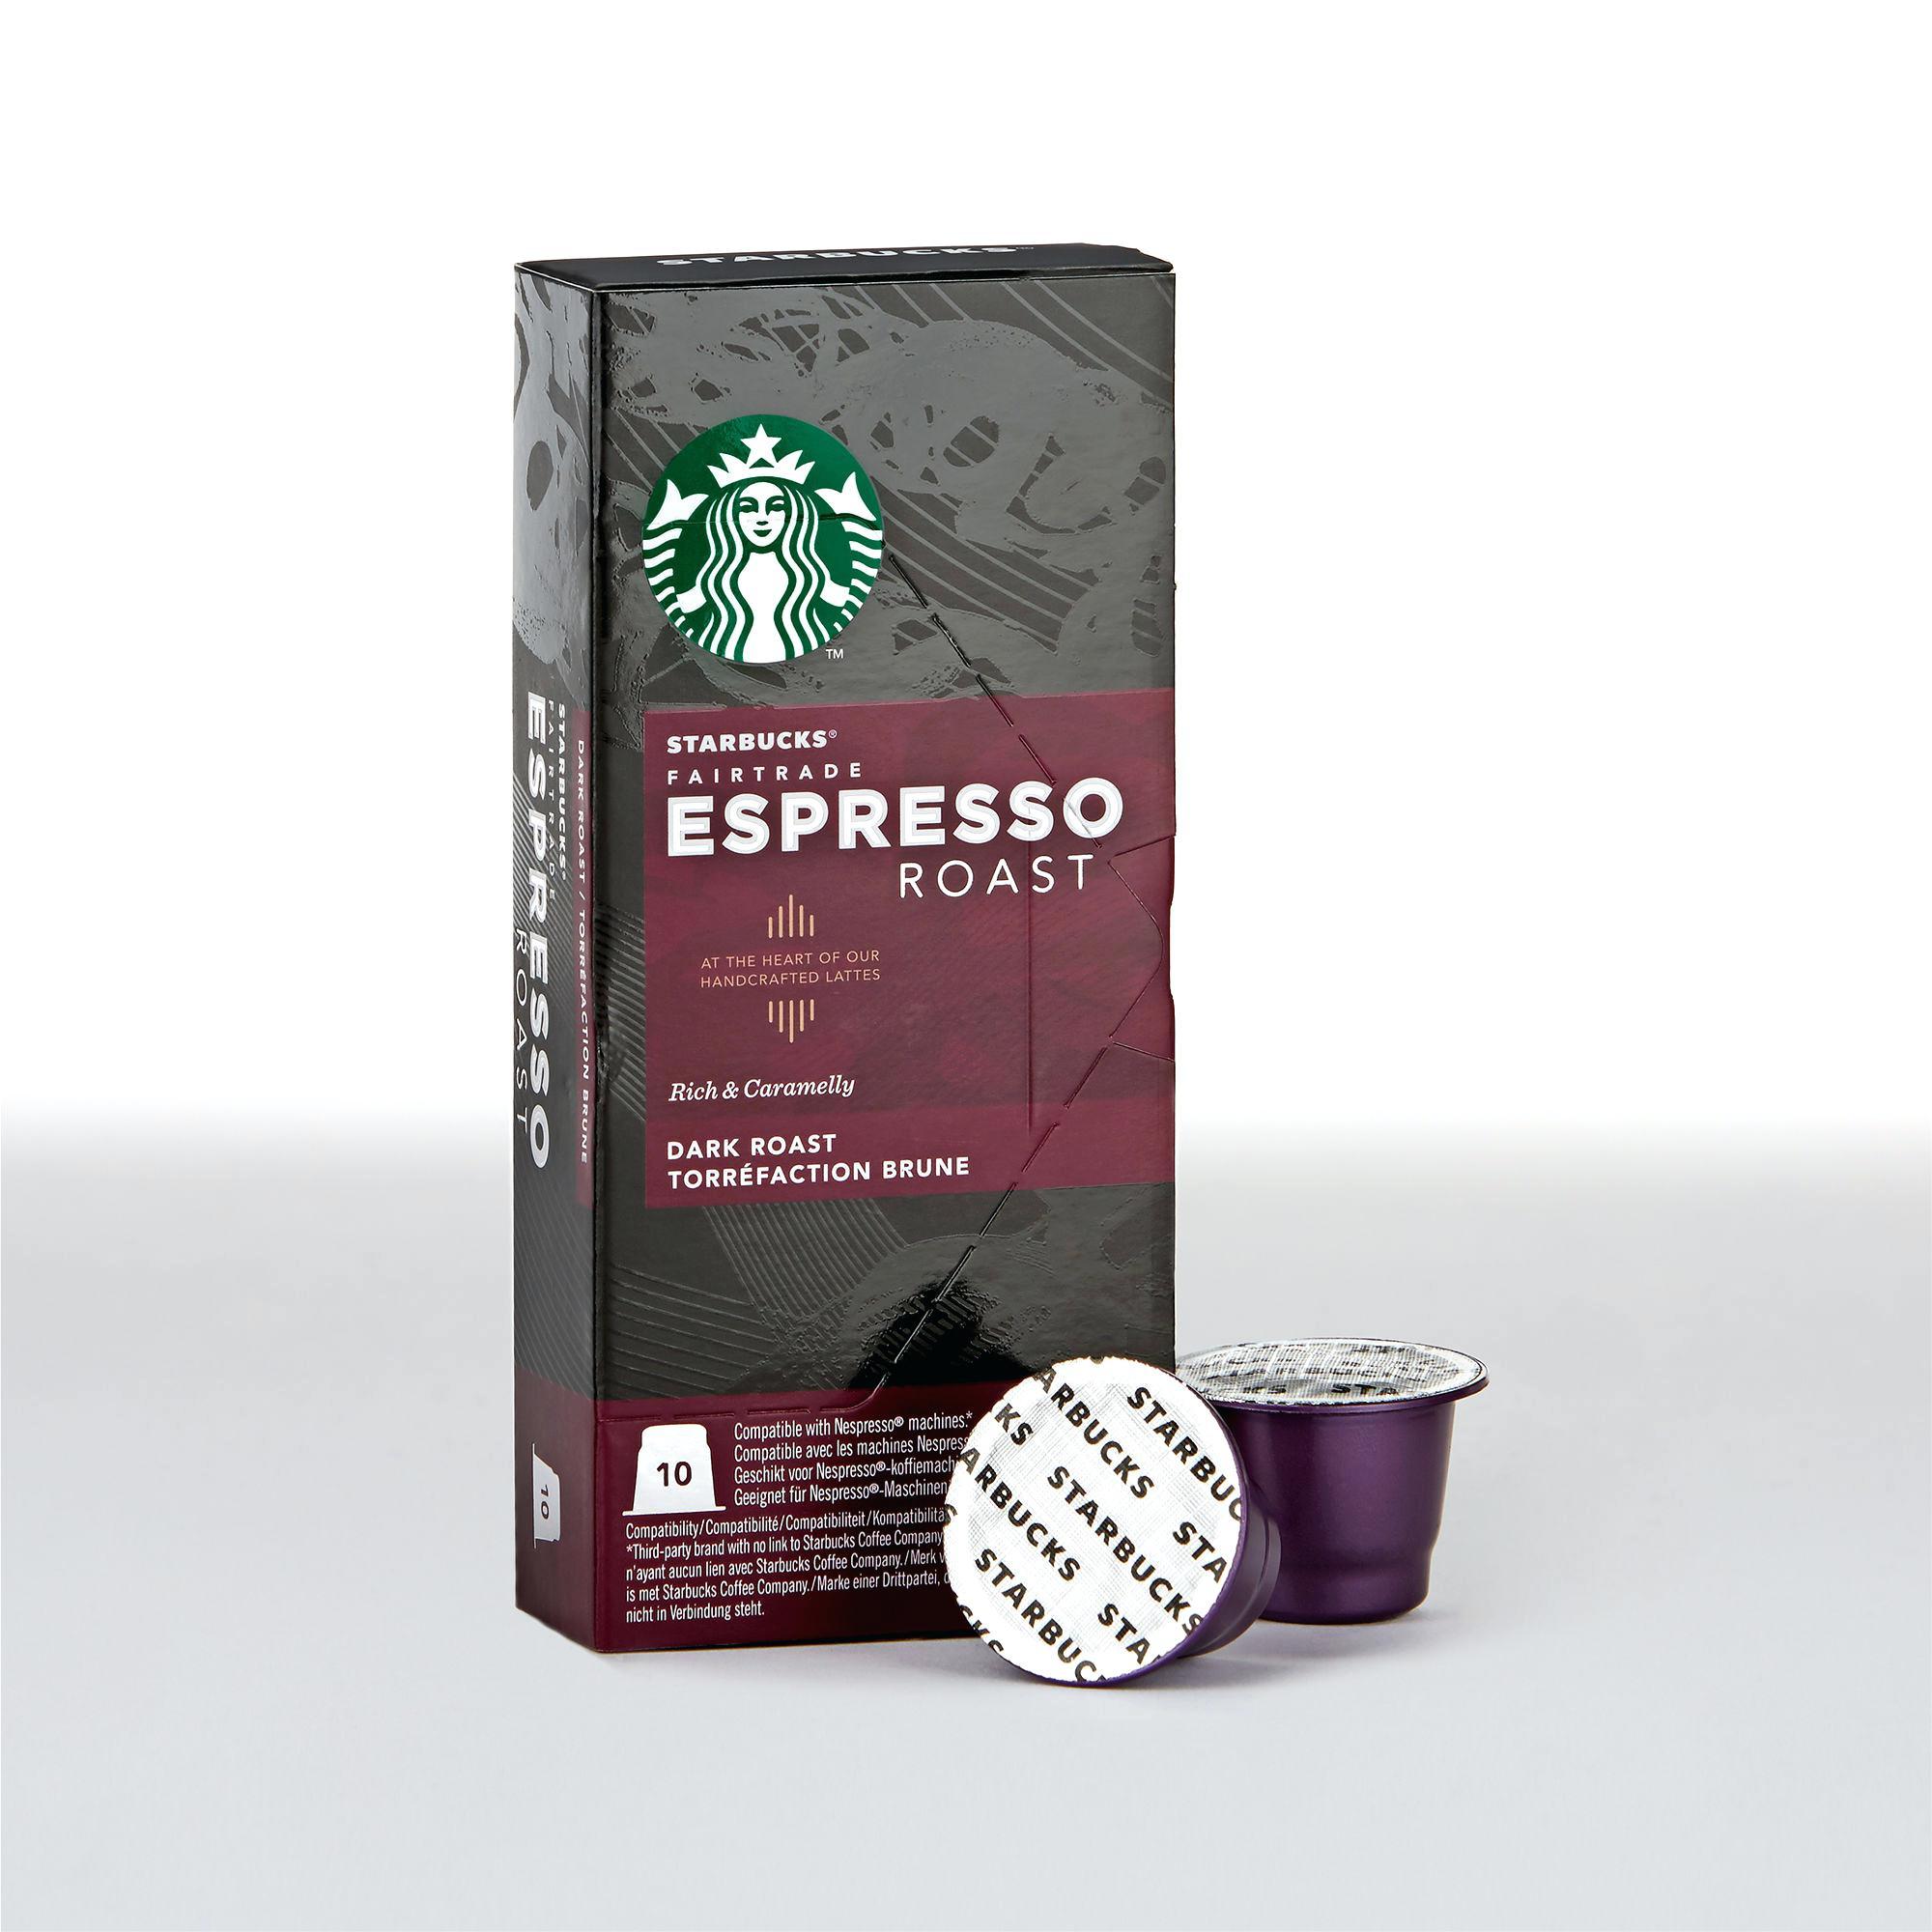 Starbucks Fairtrade Espresso Roast Nespresso Compatible Capsules Pack Of 12 Total 120 Pods